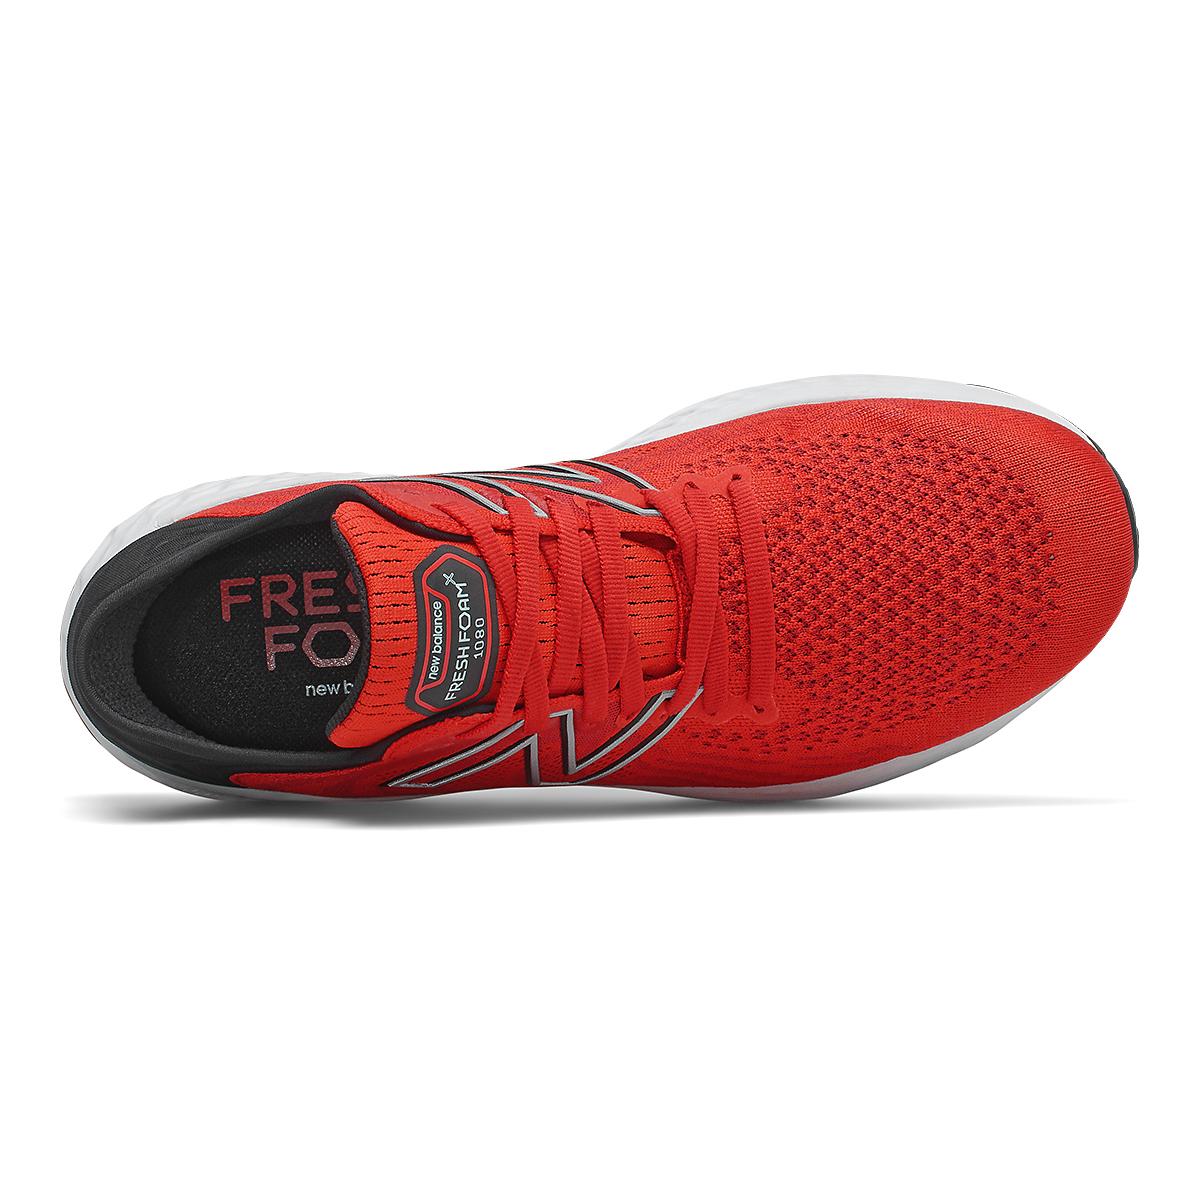 Men's New Balance 1080v11 Running Shoe - Color: Velocity Red/Black - Size: 7 - Width: Wide, Velocity Red/Black, large, image 4